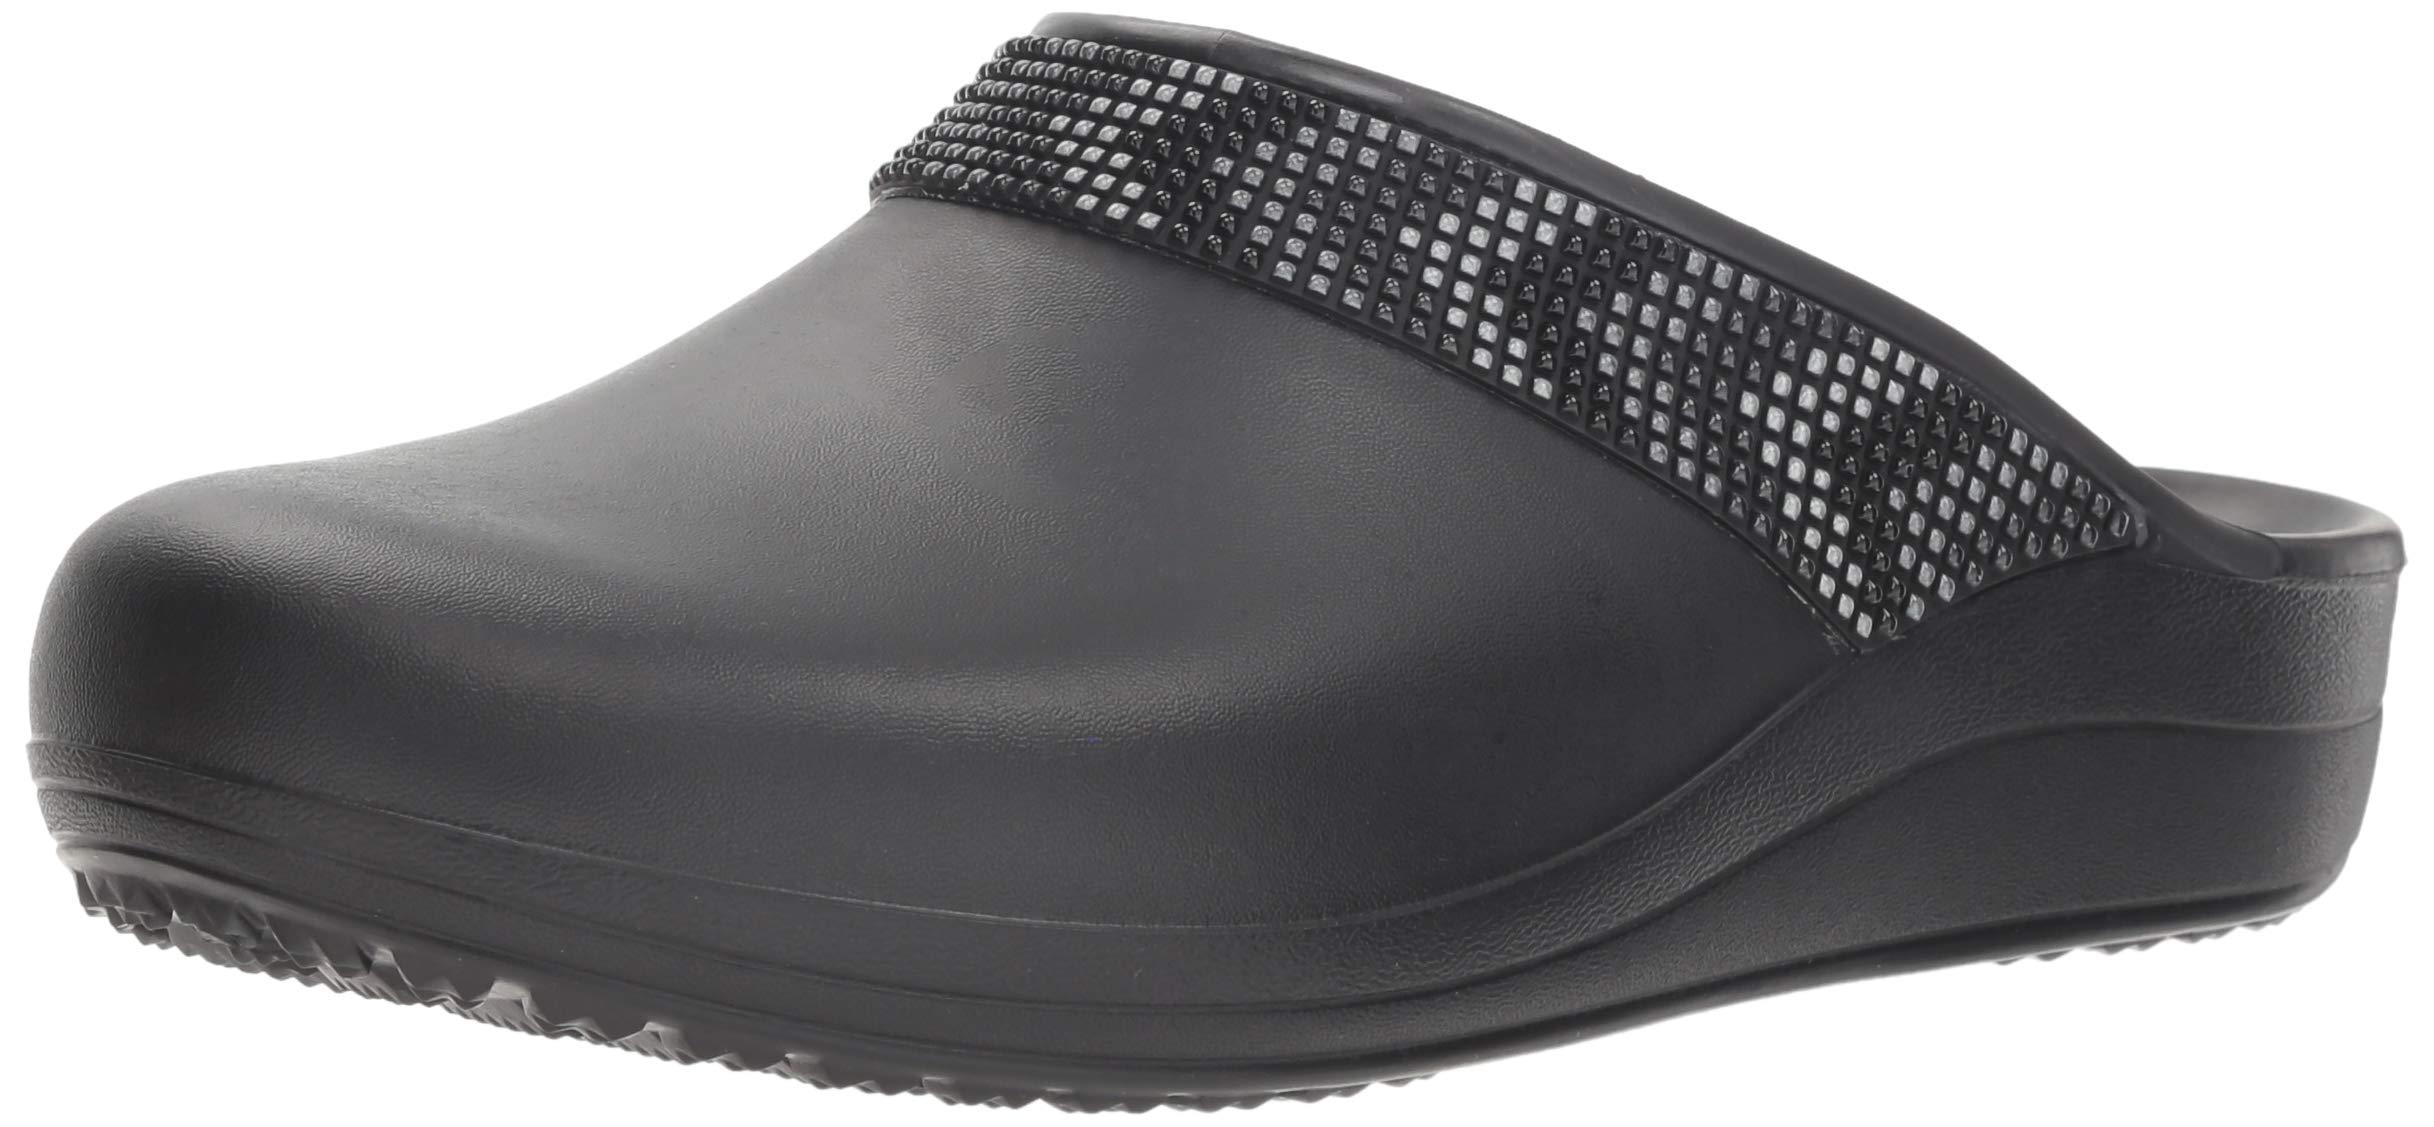 Crocs Women's Sloane Diamante Clog